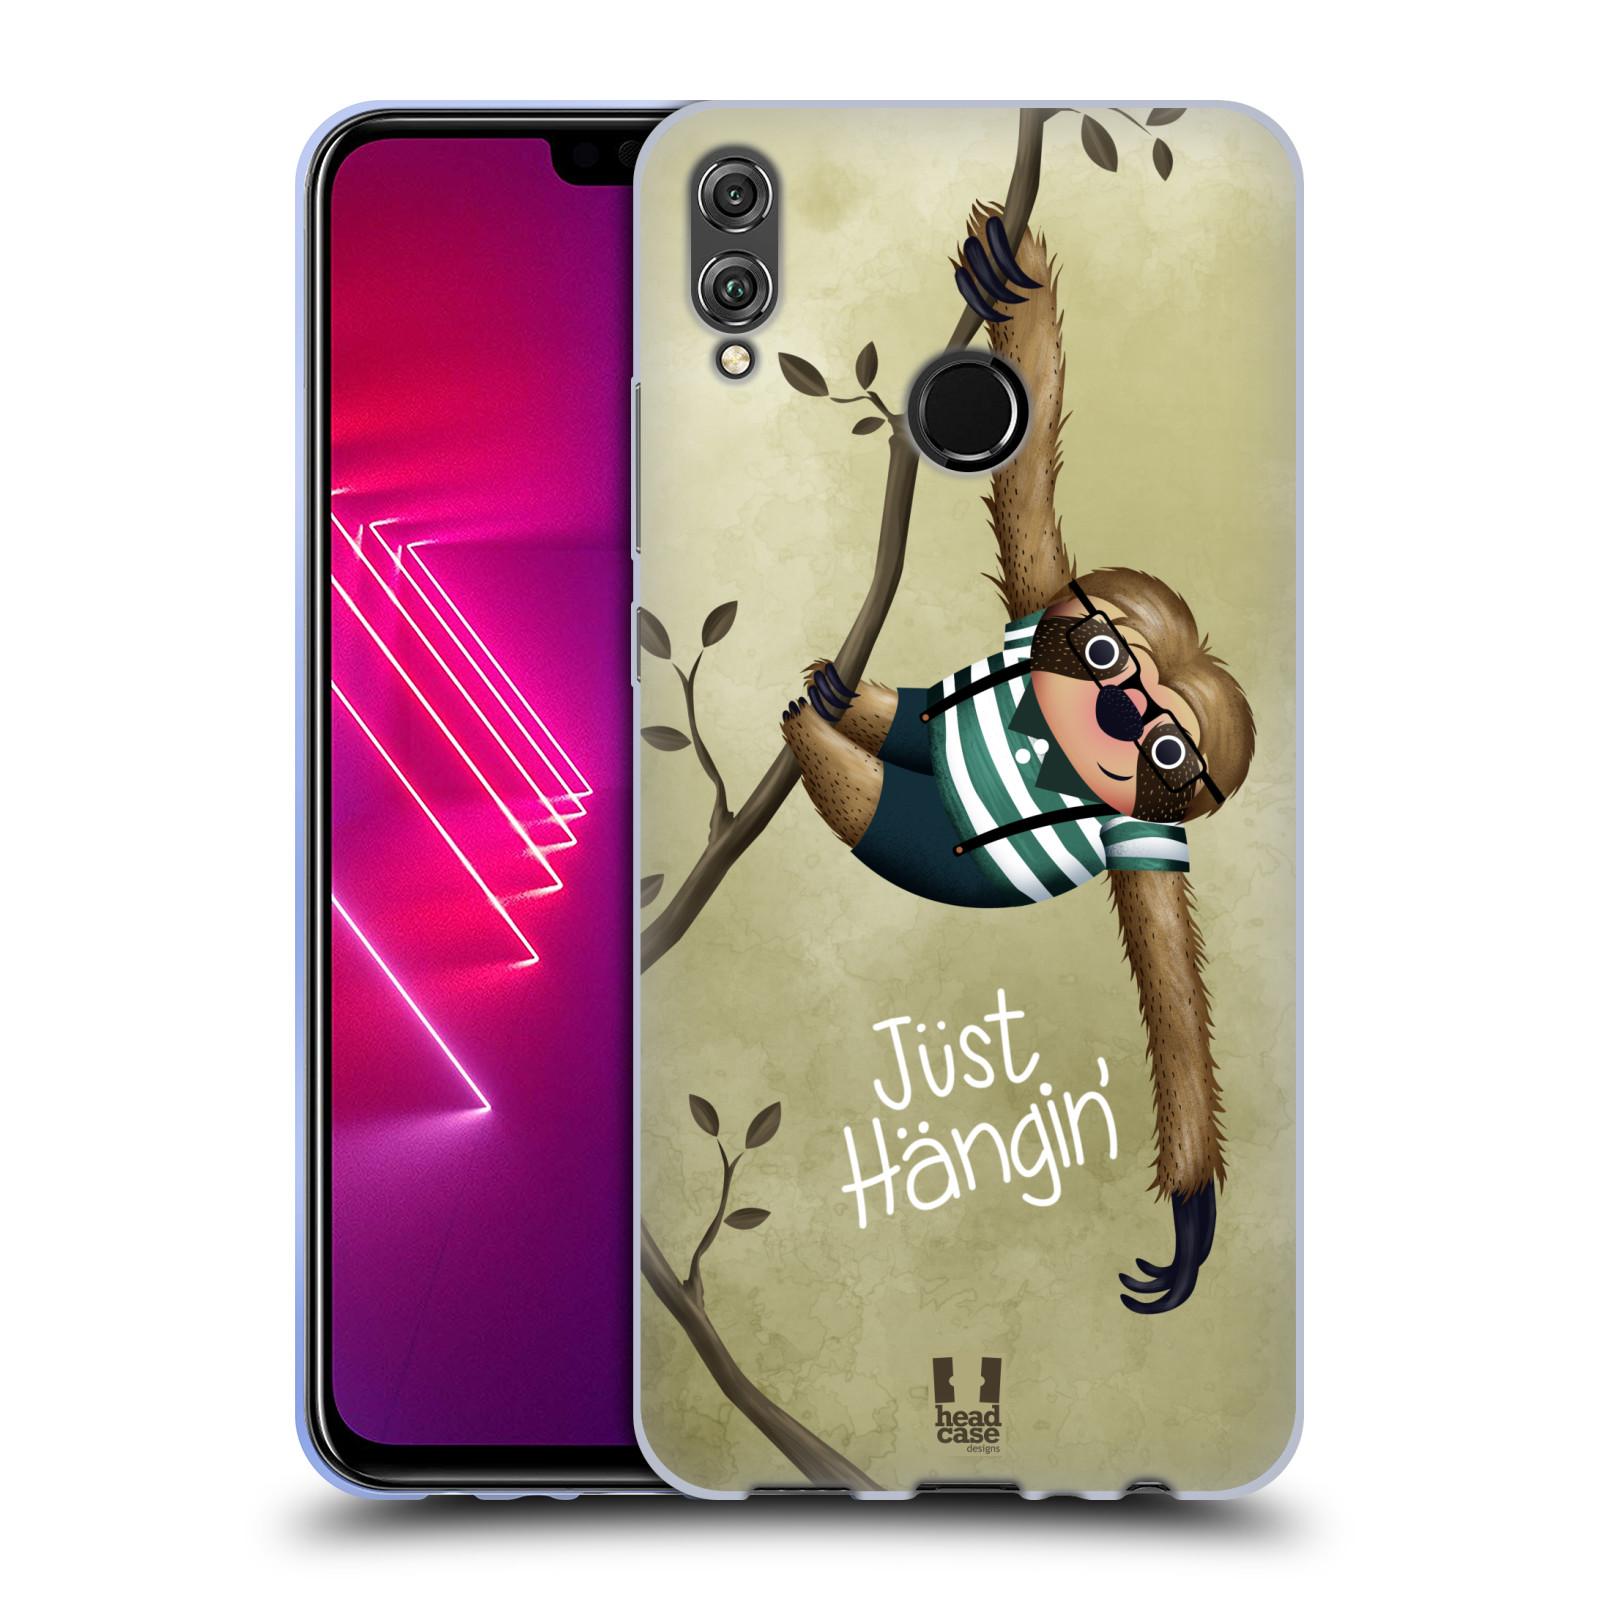 Silikonové pouzdro na mobil Honor View 10 Lite - Head Case - Lenochod Just Hangin